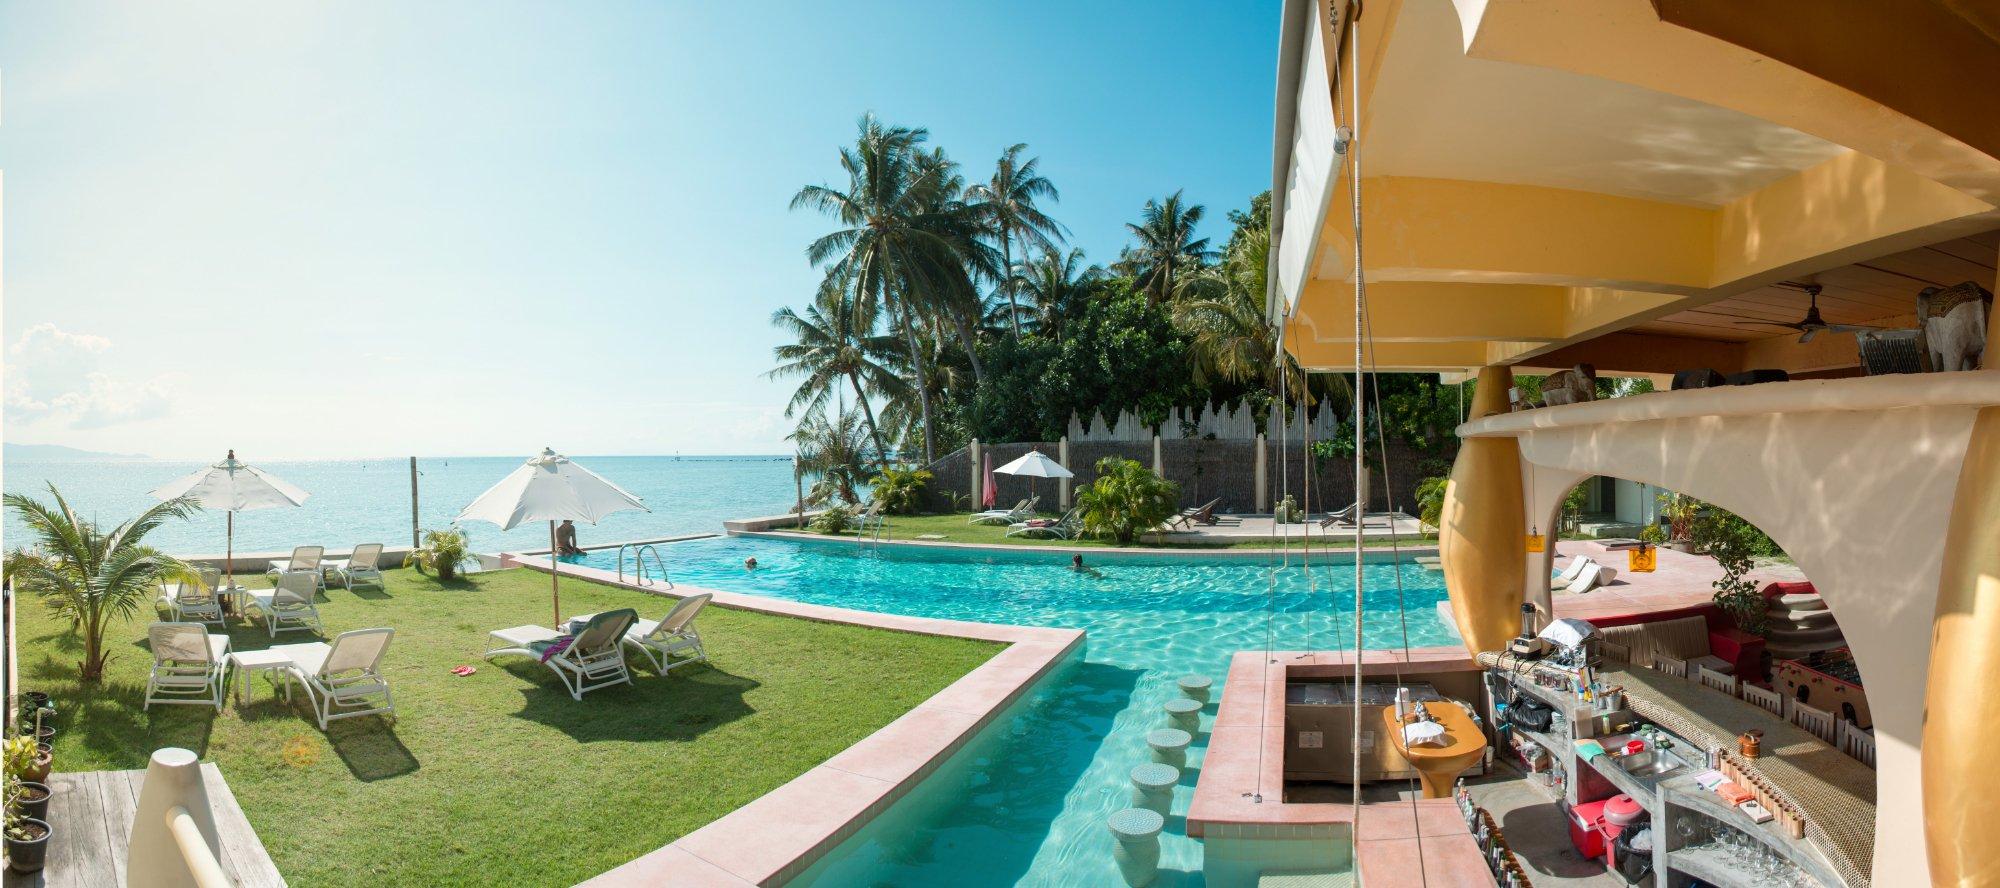 Best Romantic Hotels in Thailand - TripAdvisor Travelers\u0027 Choice ...